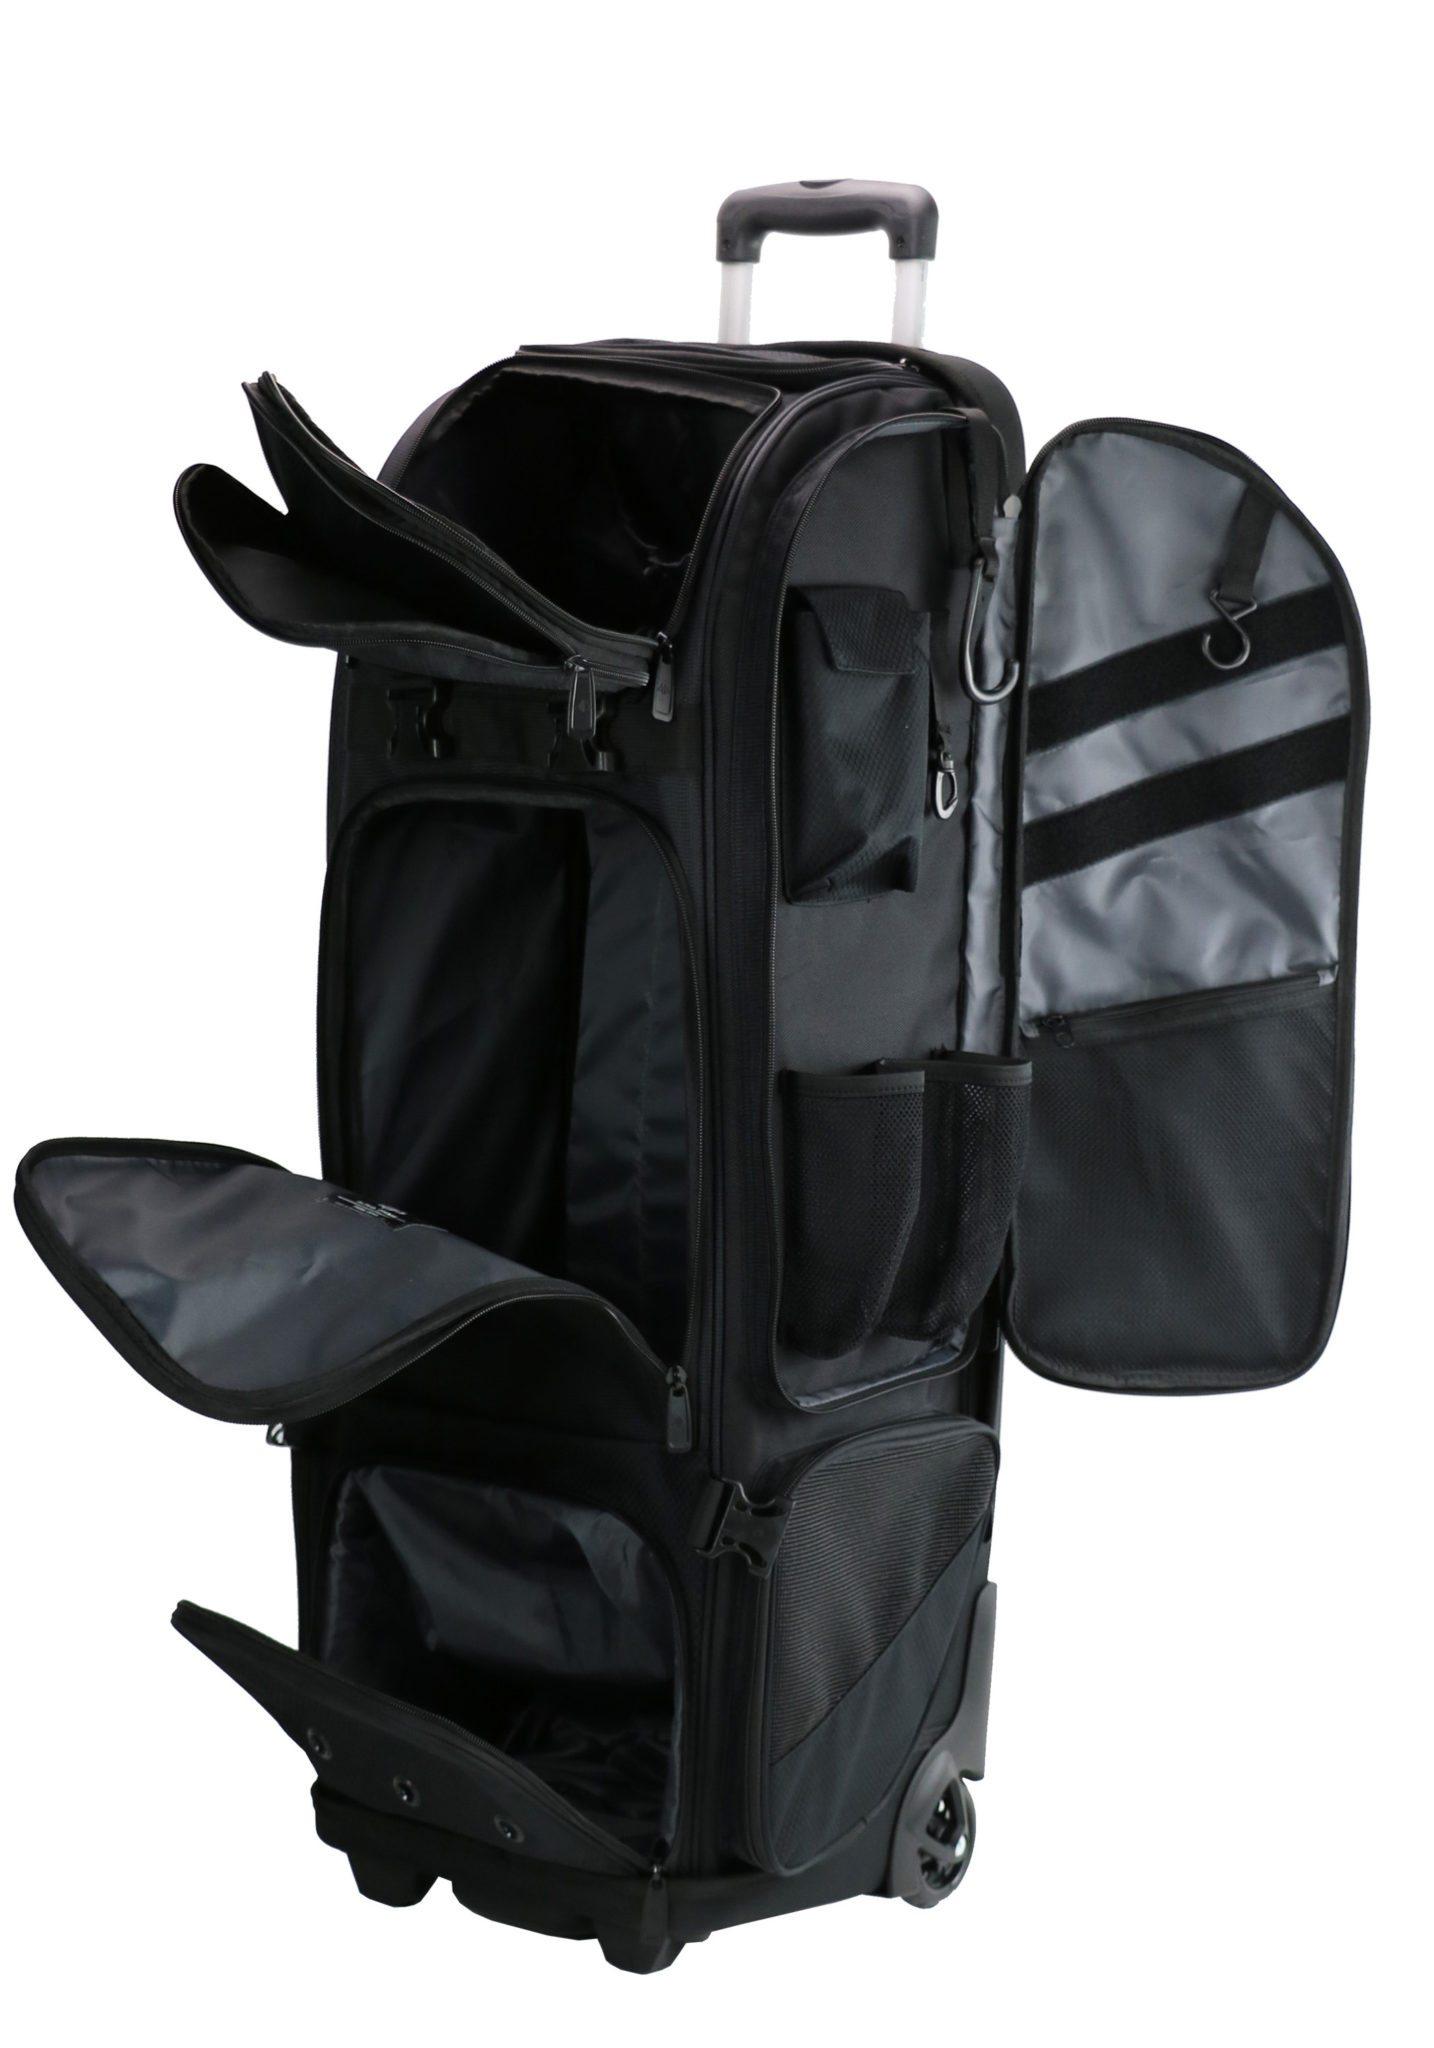 61b6b91543f Free photo  bag - Present